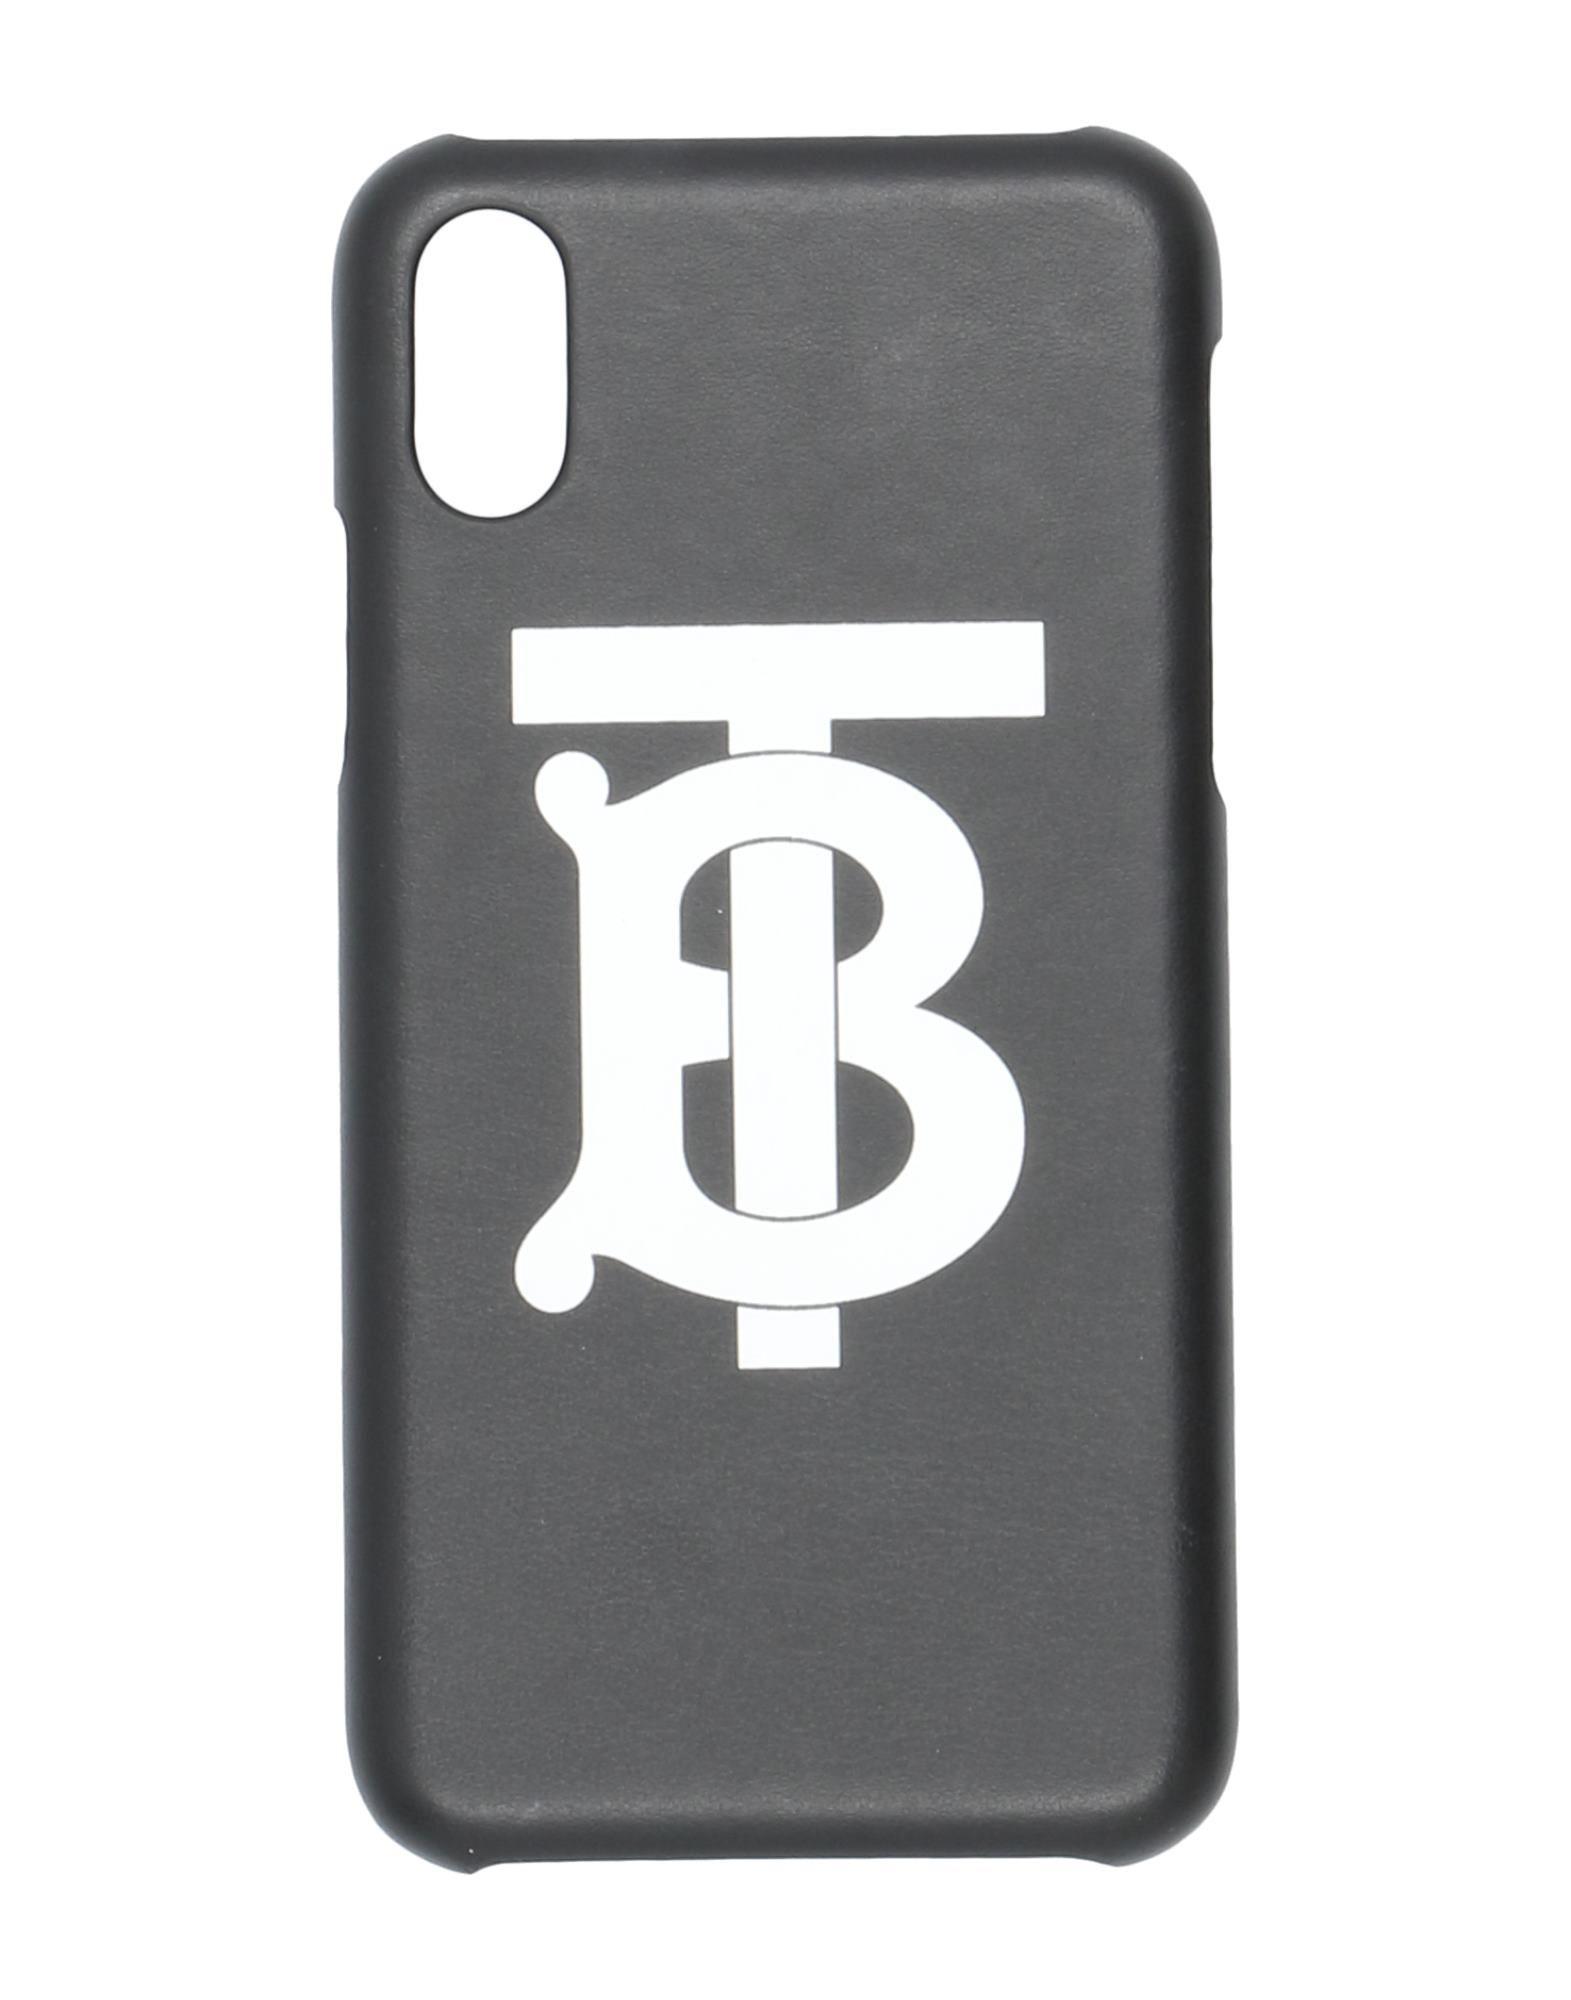 Фото - BURBERRY Чехол чехол накладка для apple iphone 6 6s deppa gel plus case 85213 pink клип кейс полиуретан